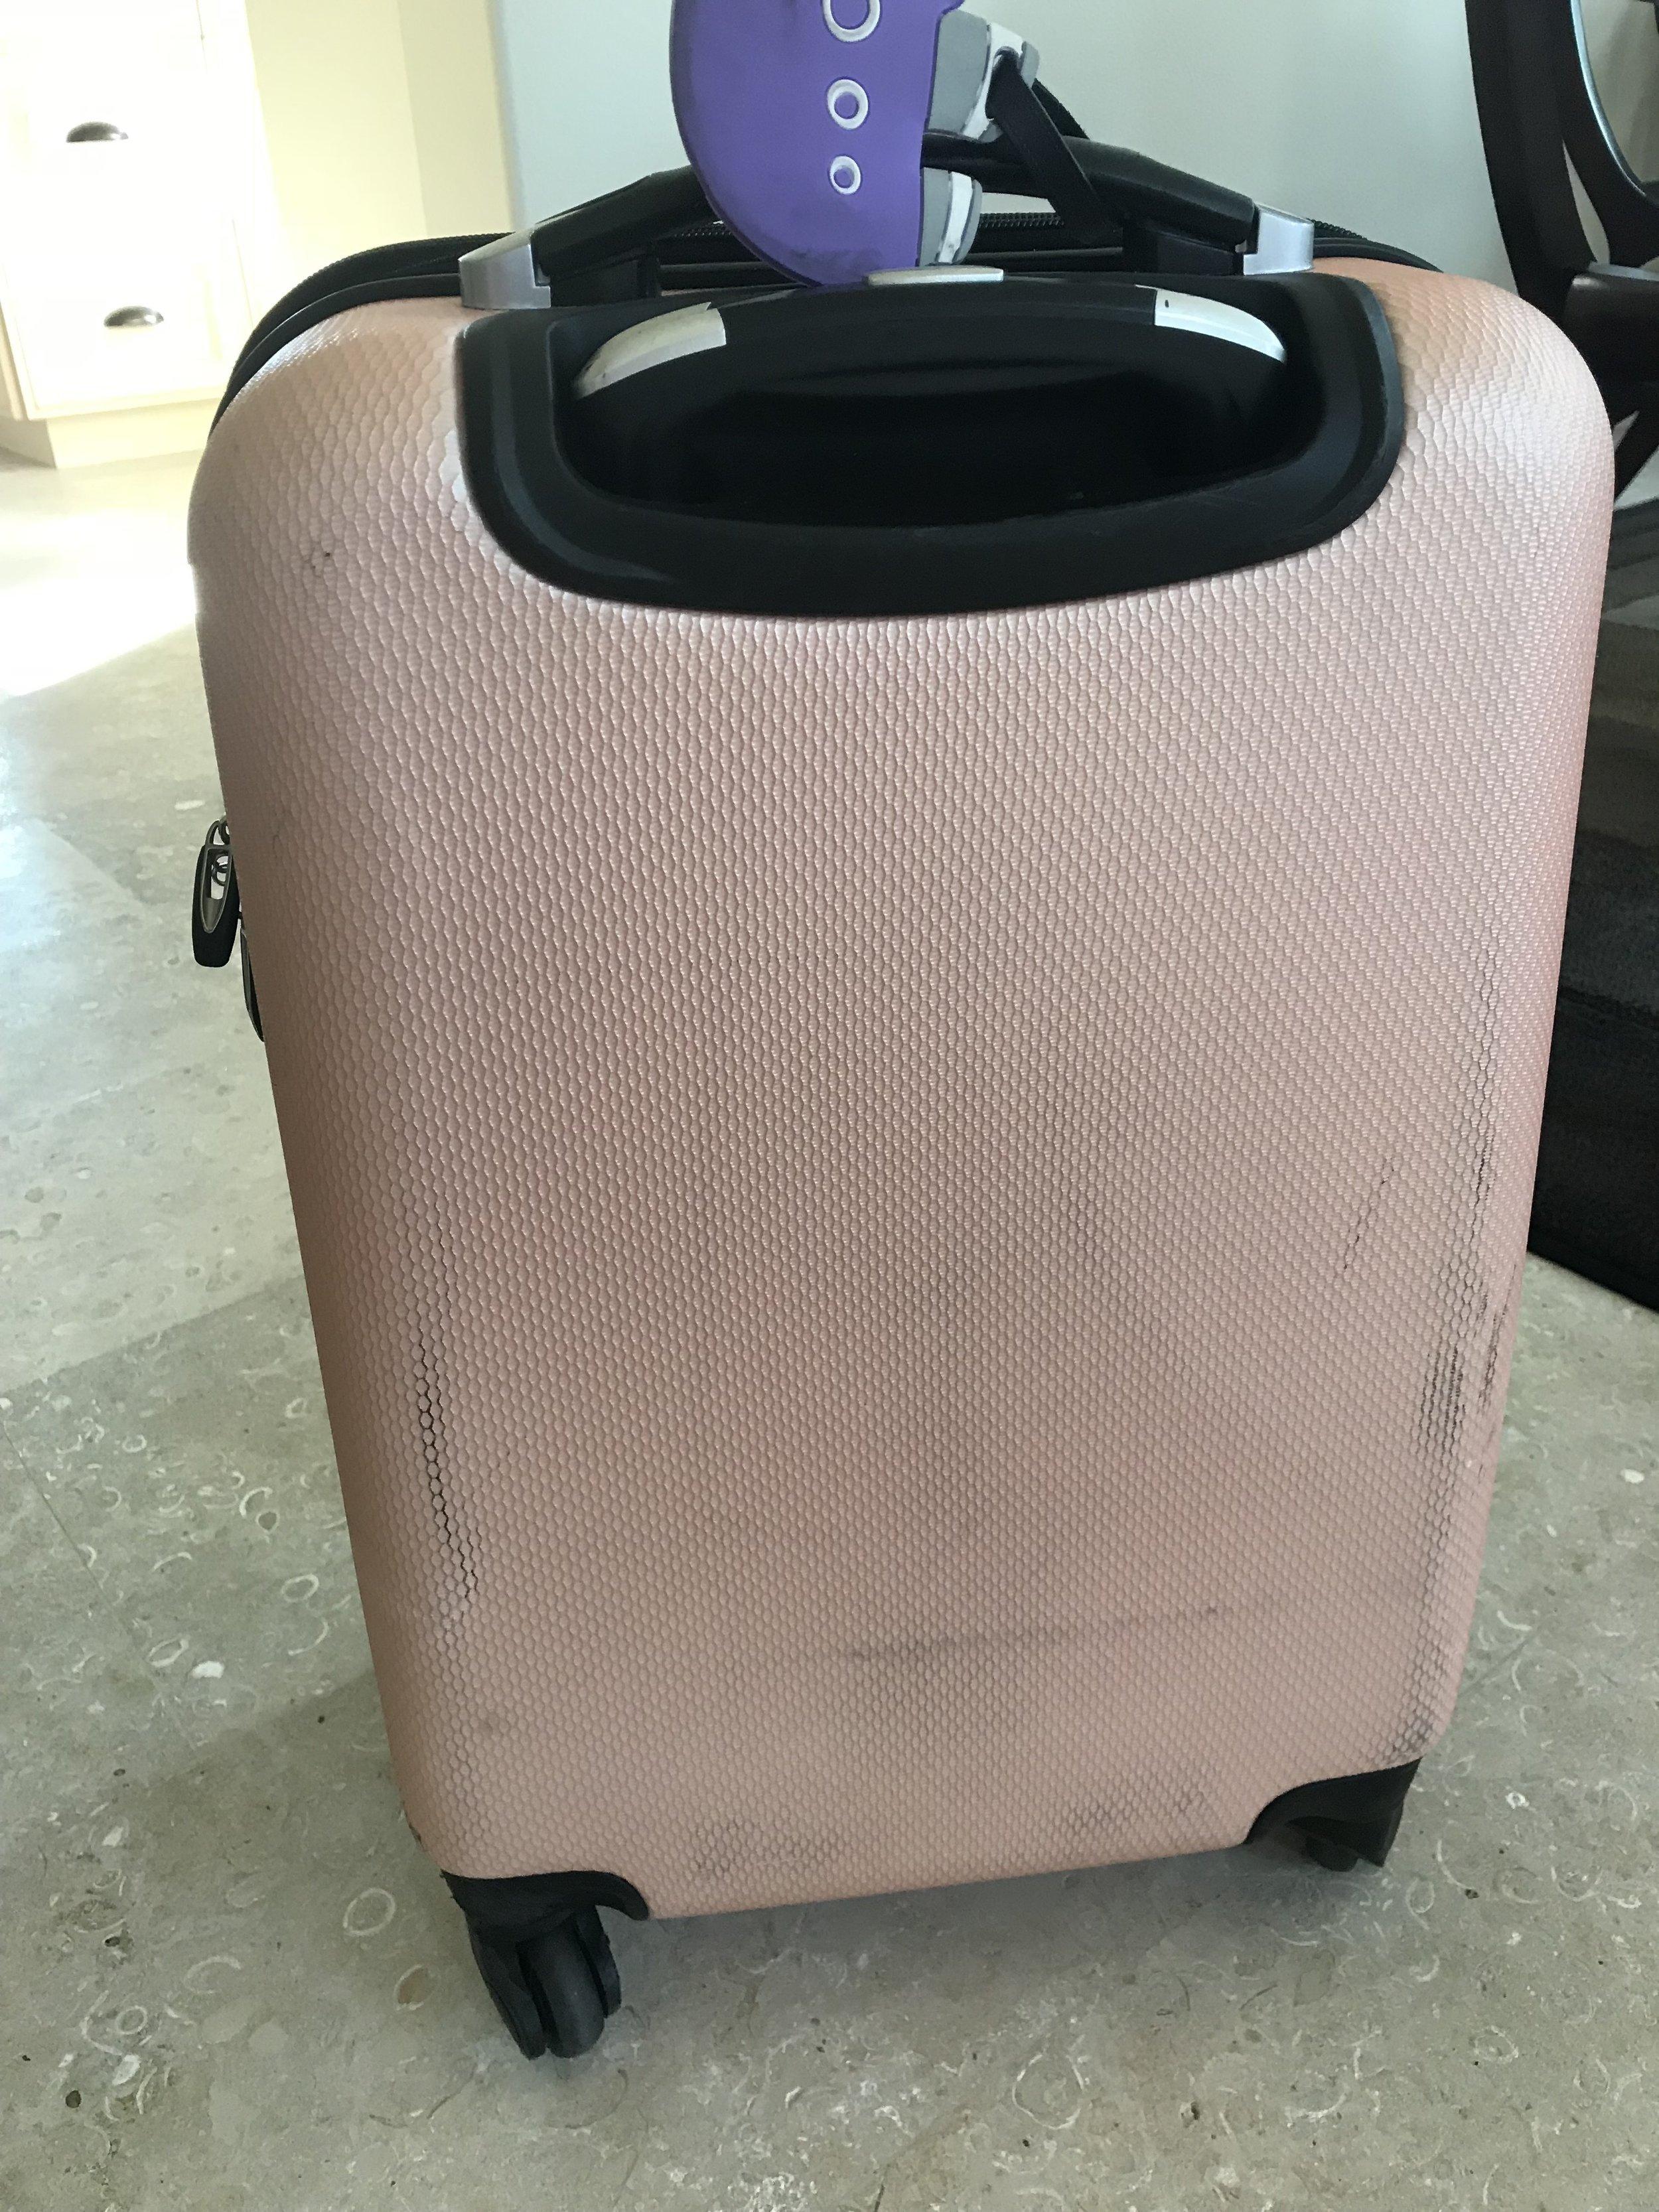 Luggage Before - Scuffs galore